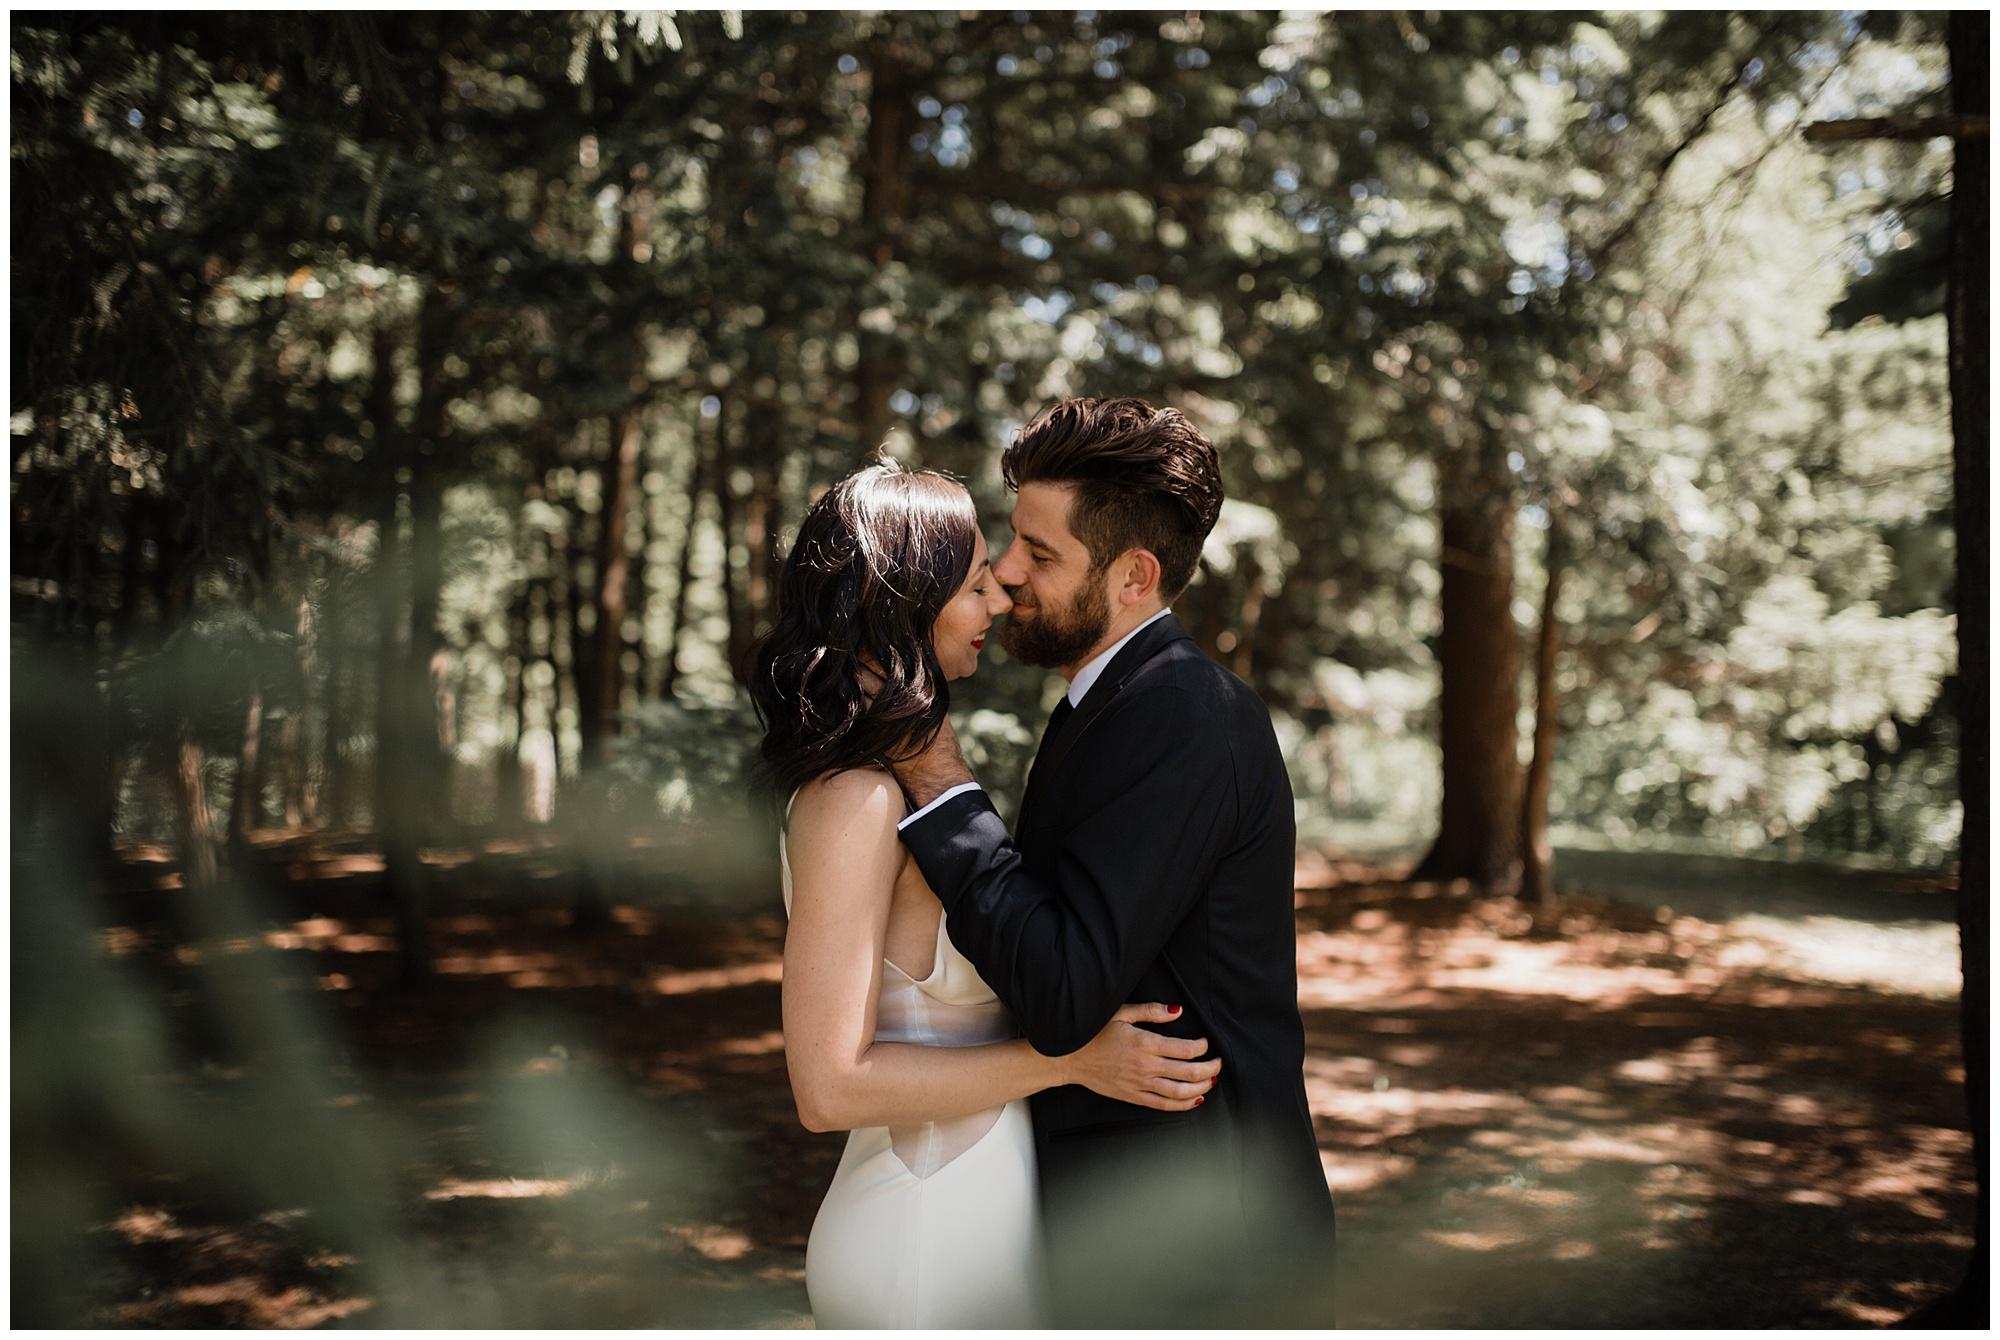 allerton_park_wedding_champaign_il_chicago_wright_photographs_ne_0067.jpg